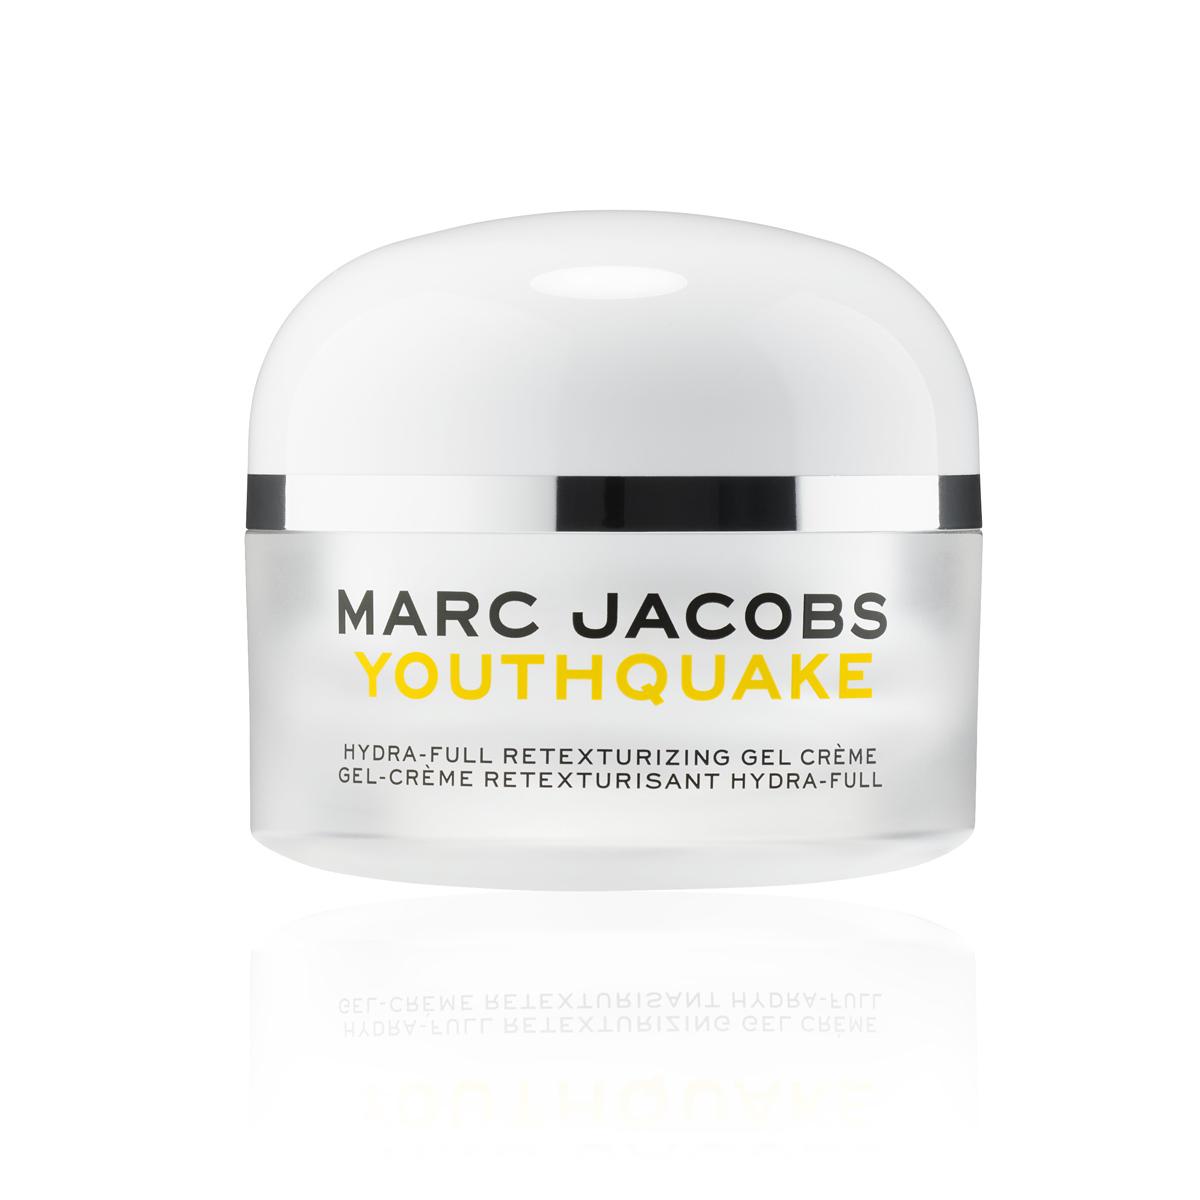 Gel Crème Hydra Full Retexturising Youthquake Hydra de Marc Jacobs...